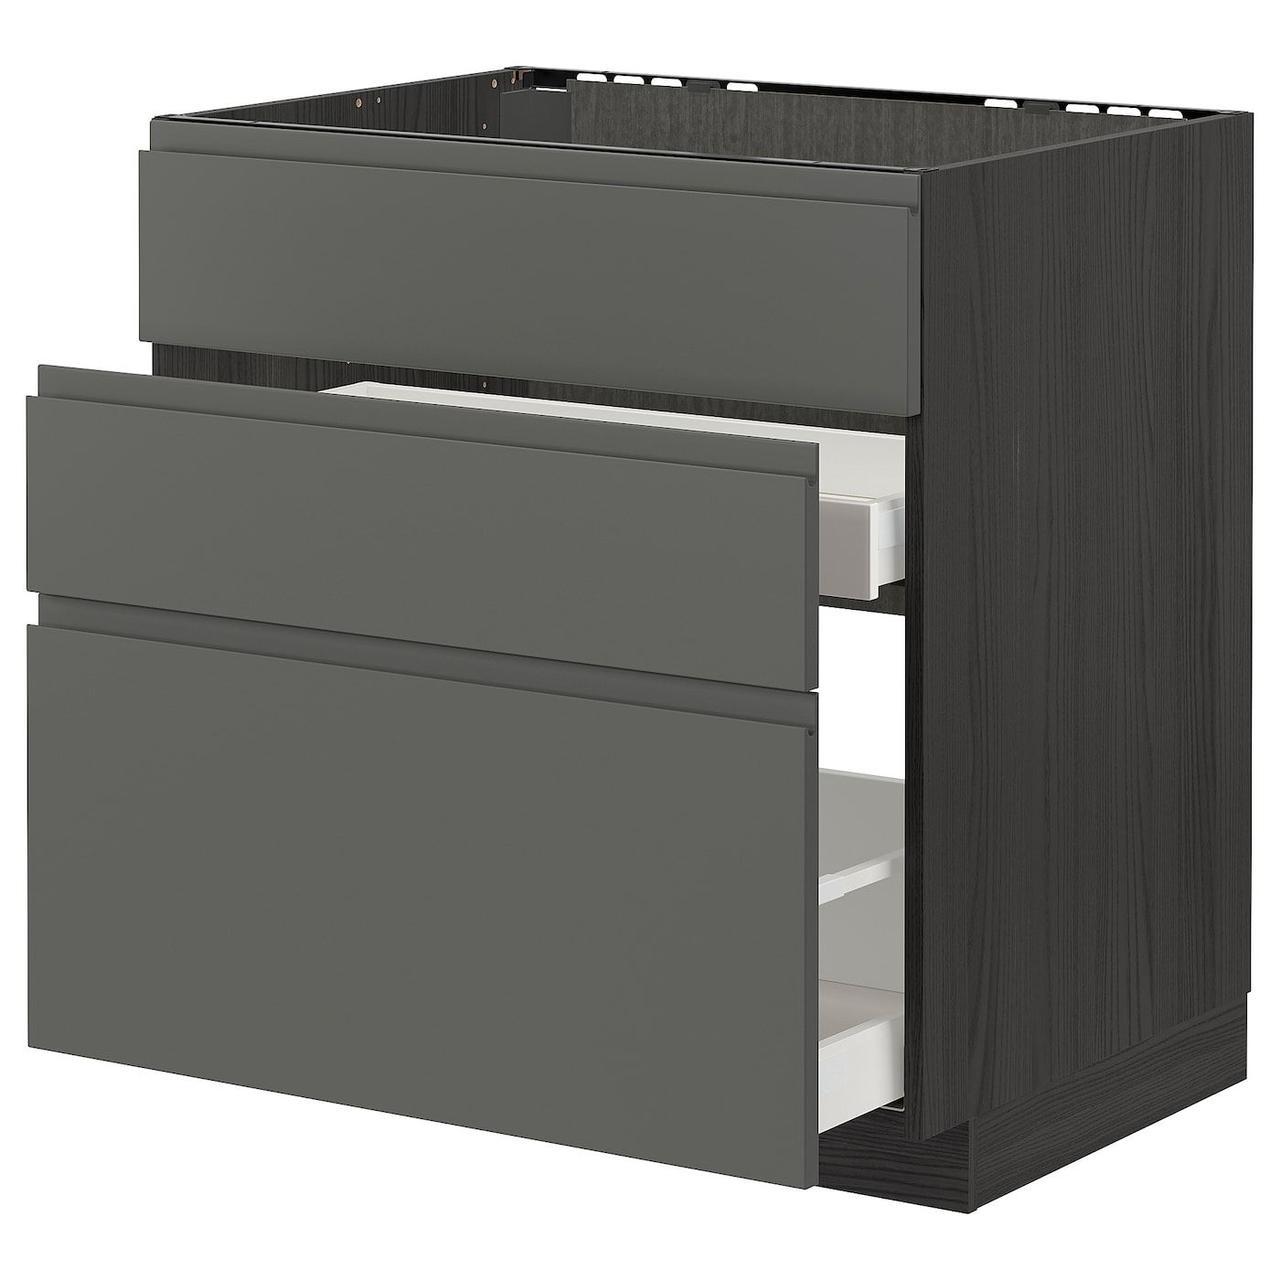 IKEA METOD / MAXIMERA (ІКЕА МЕТОДИ / MAXIMERA) 49310727